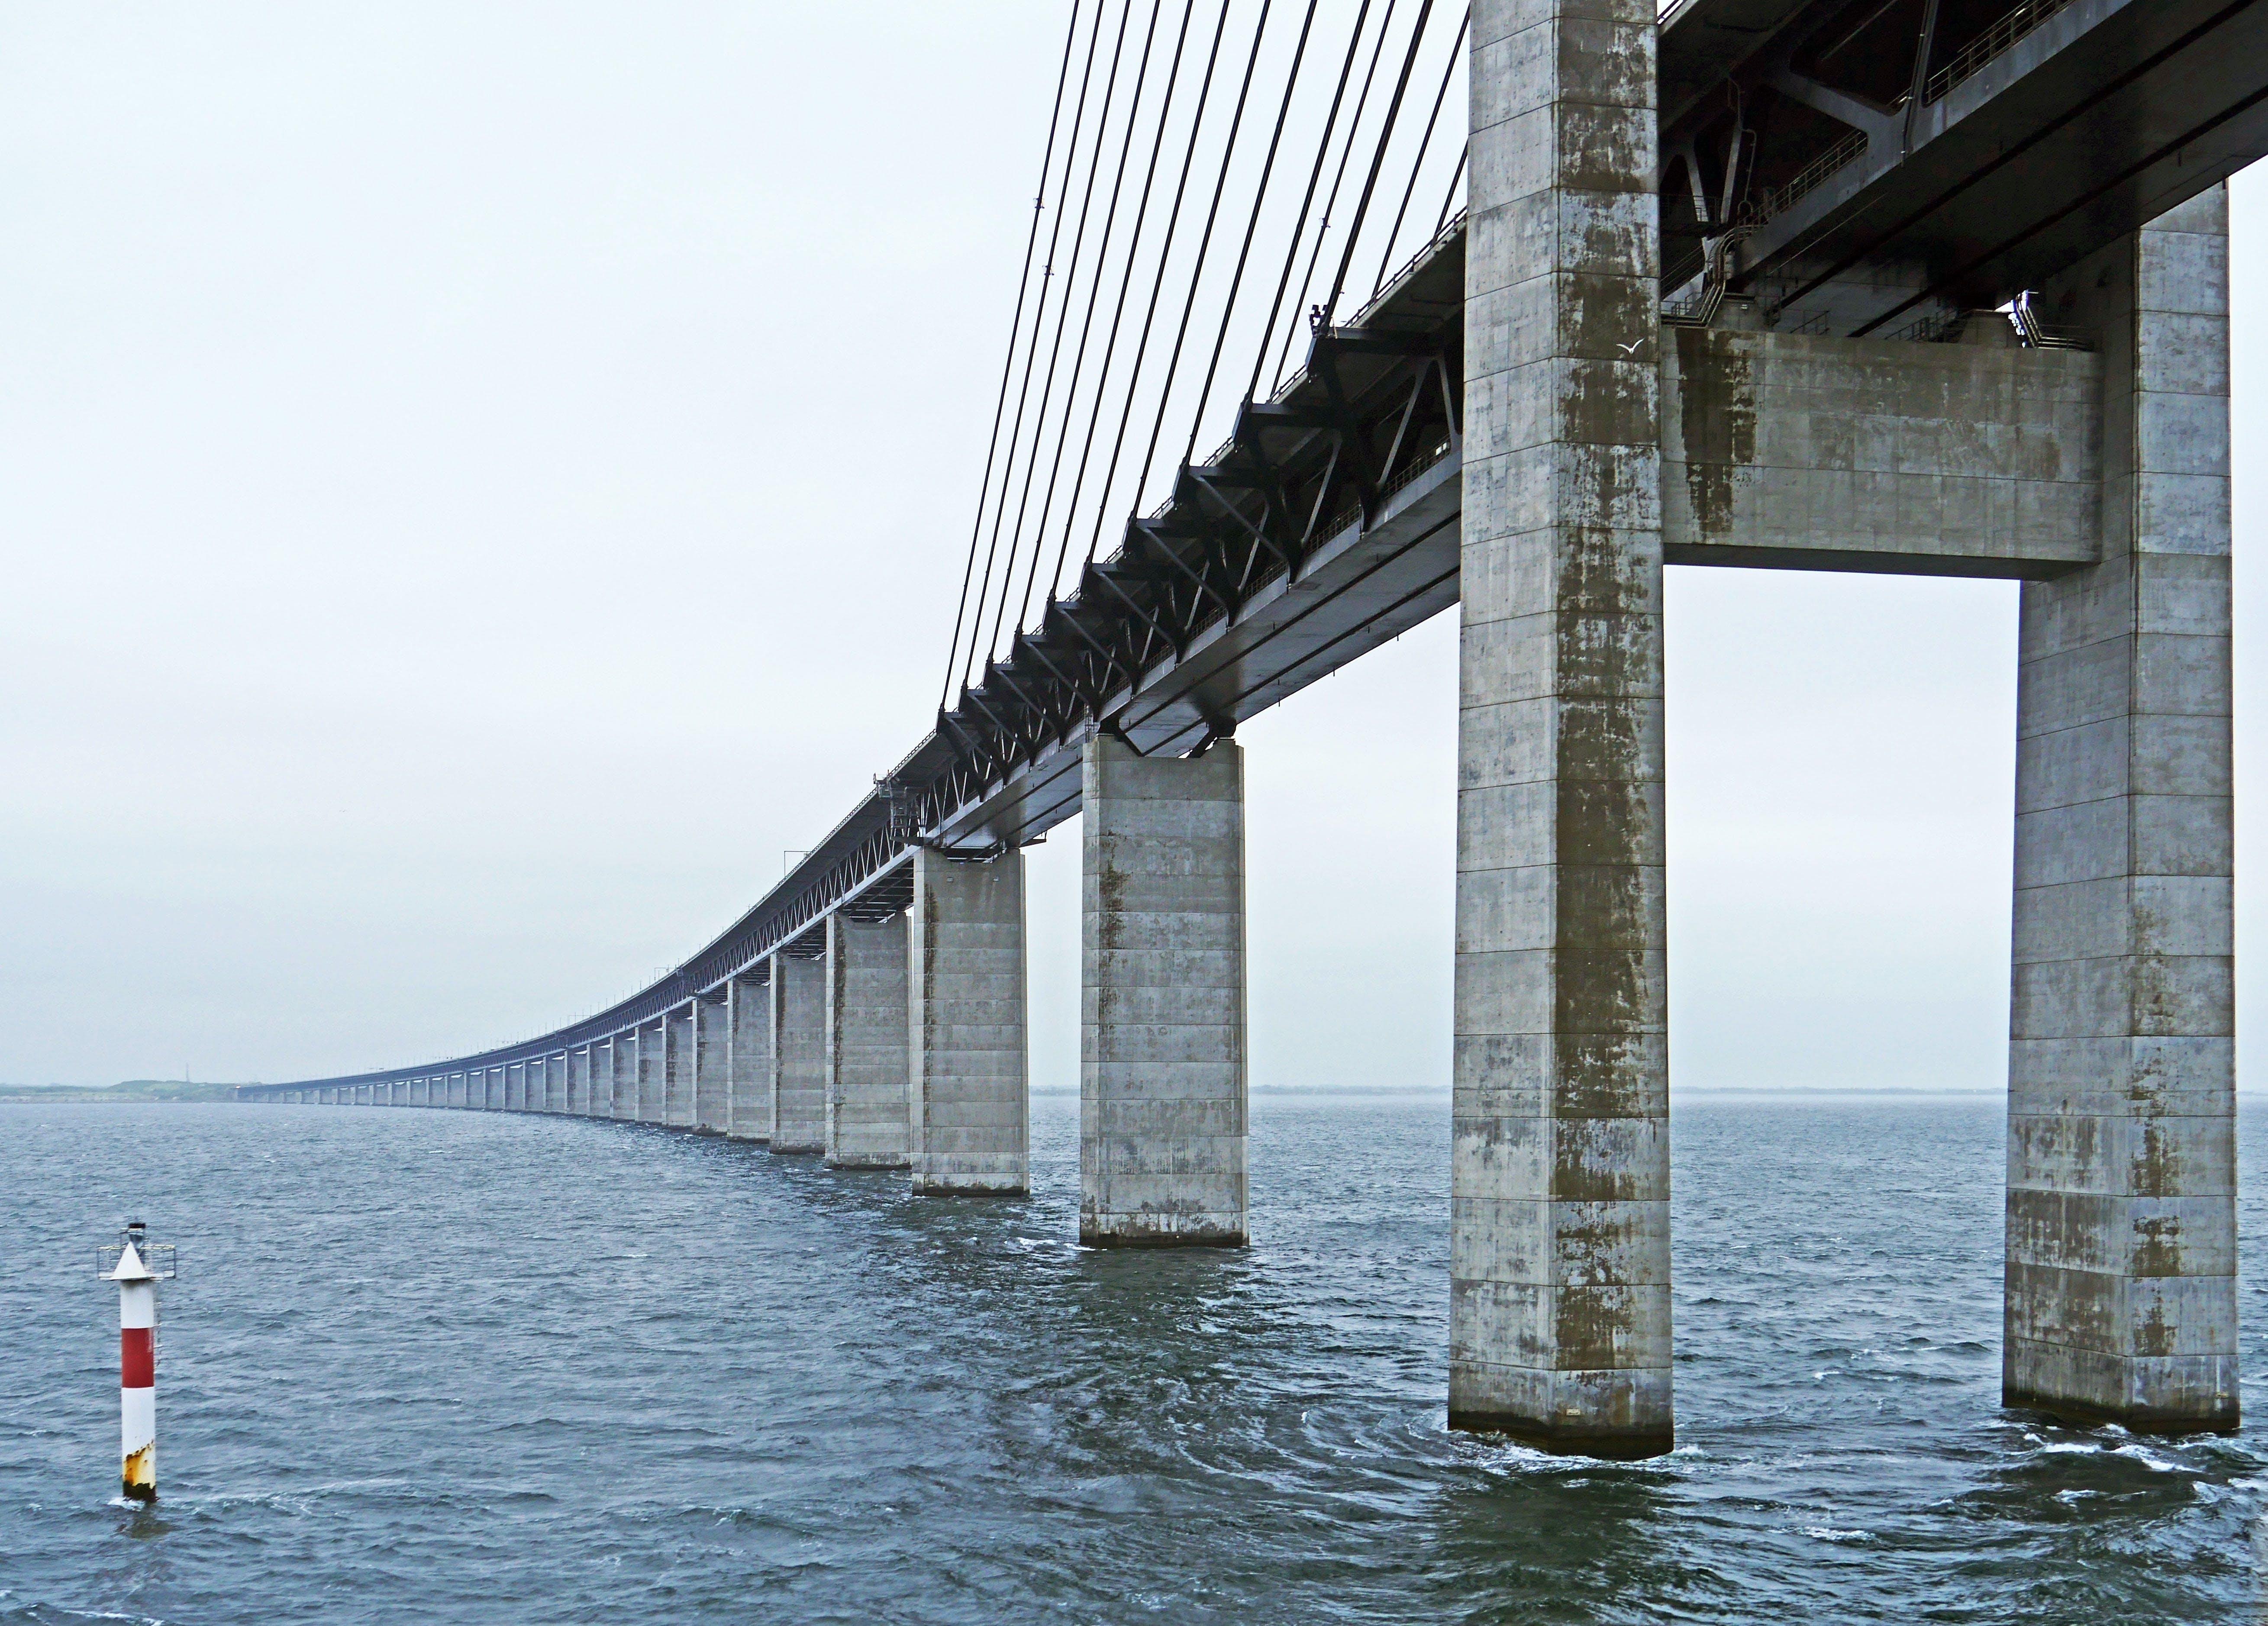 Free stock photo of scandinavia, highway, sound, railway